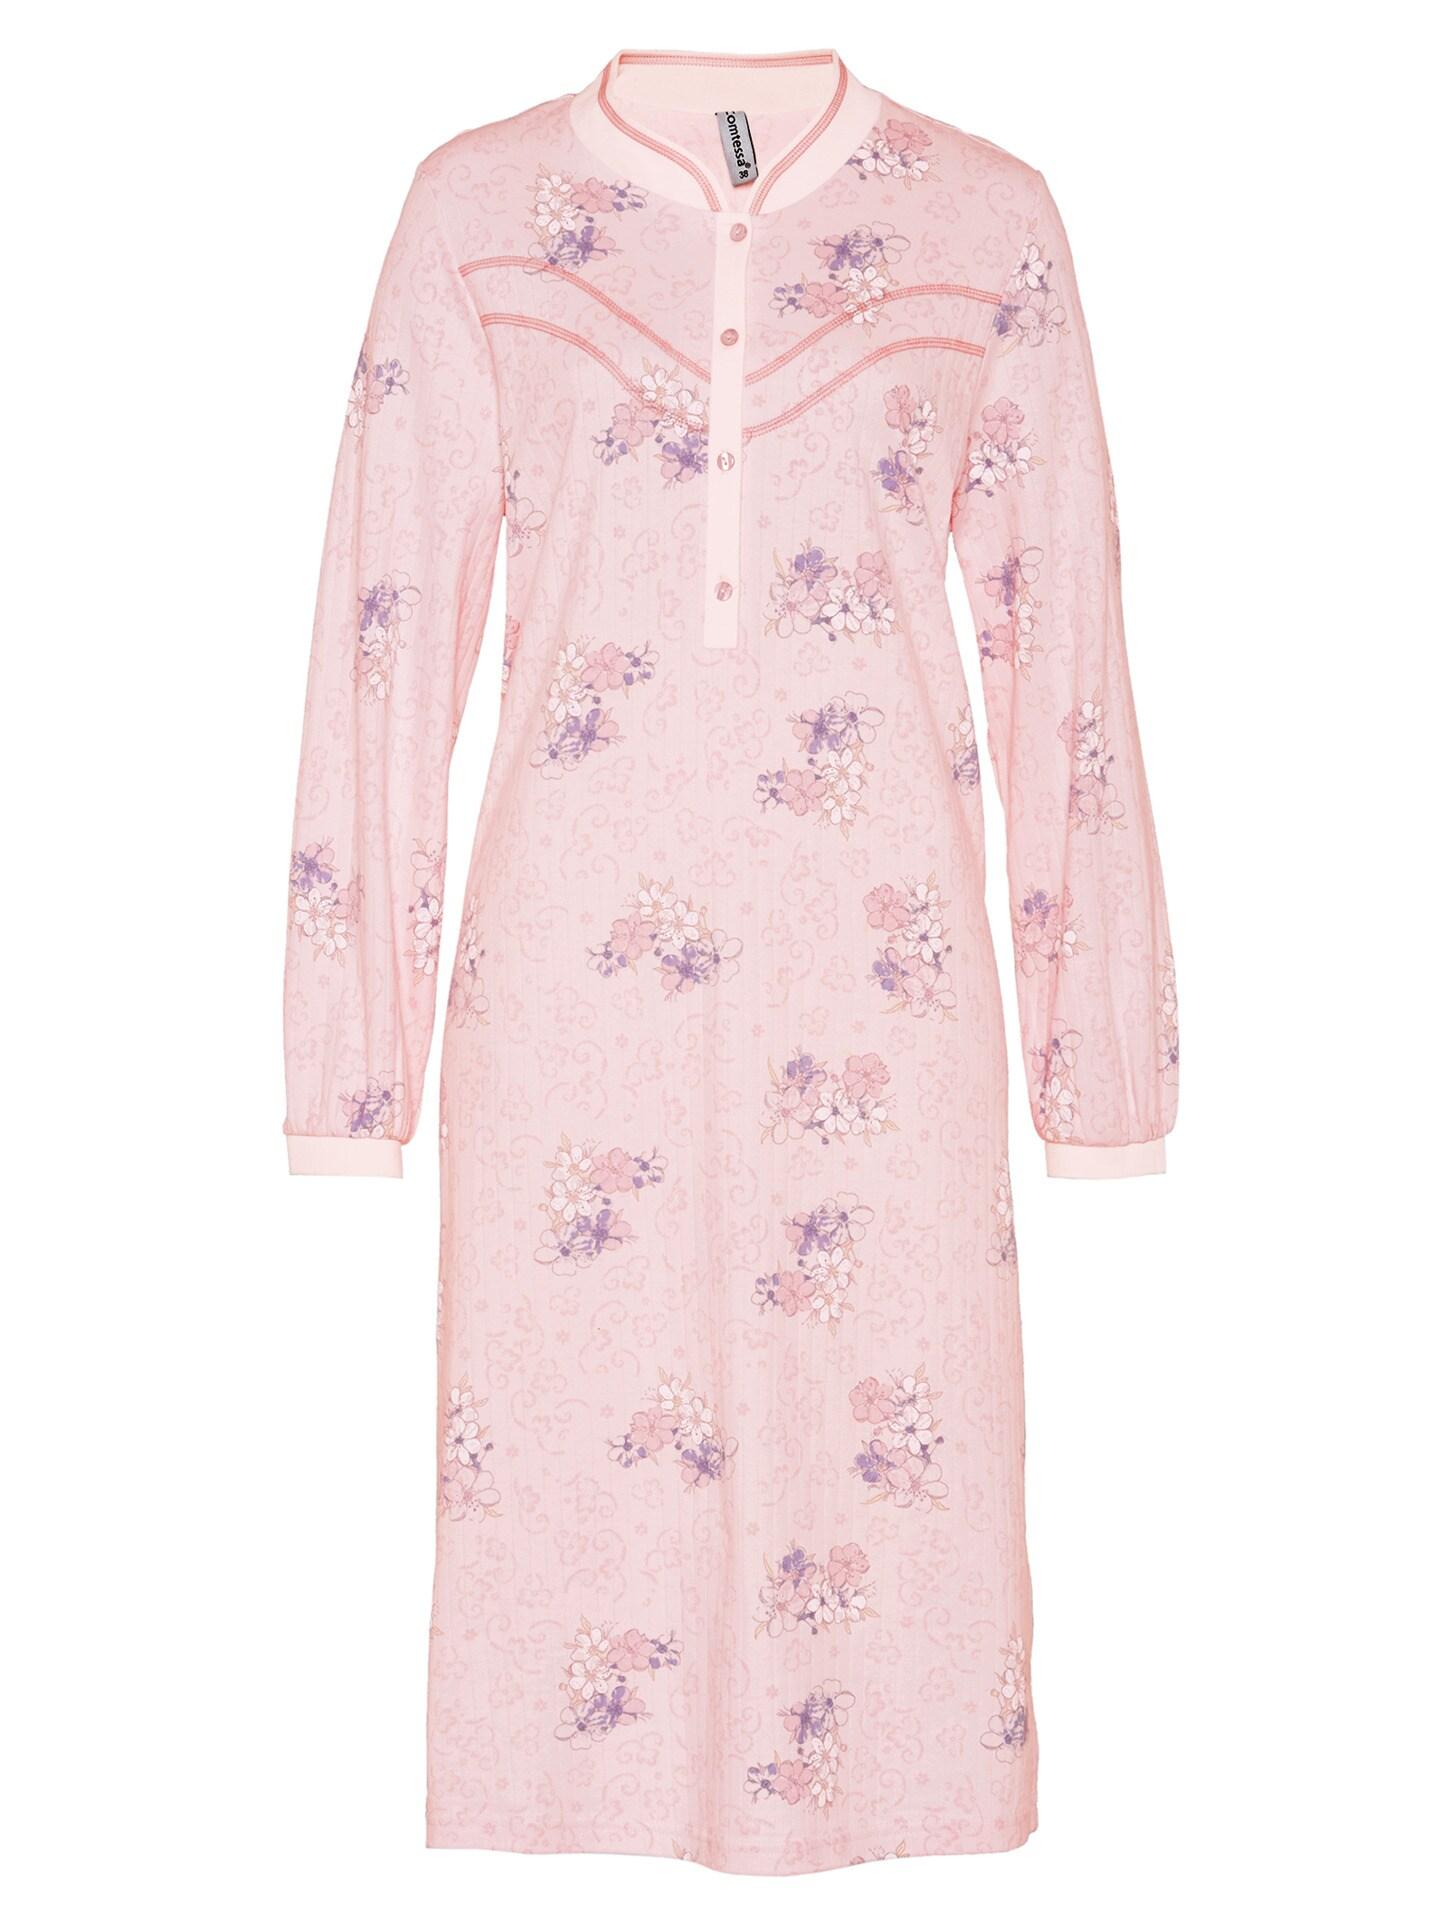 Avena Damen Thermo-Nachthemd Blütendessin Rosé 42-6142-7